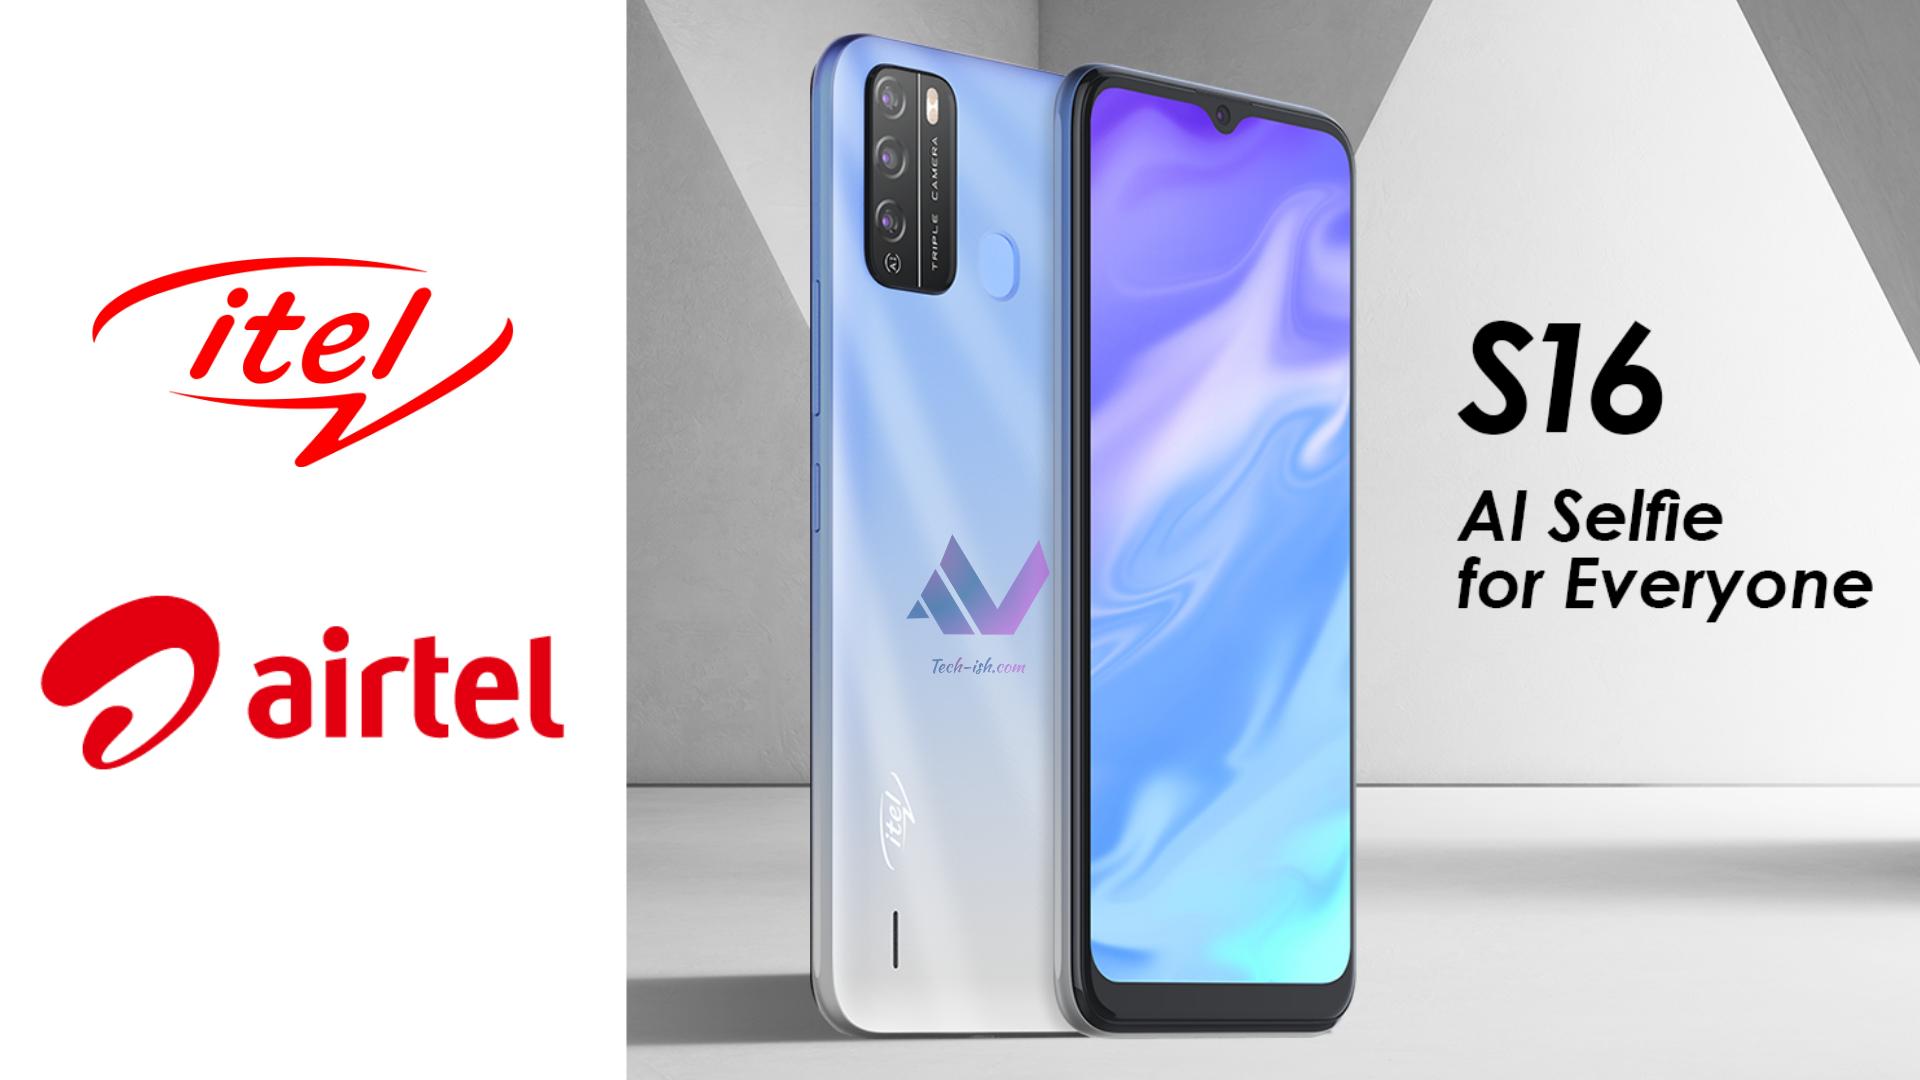 itel partnership with Airtel Kenya to offer customers free data